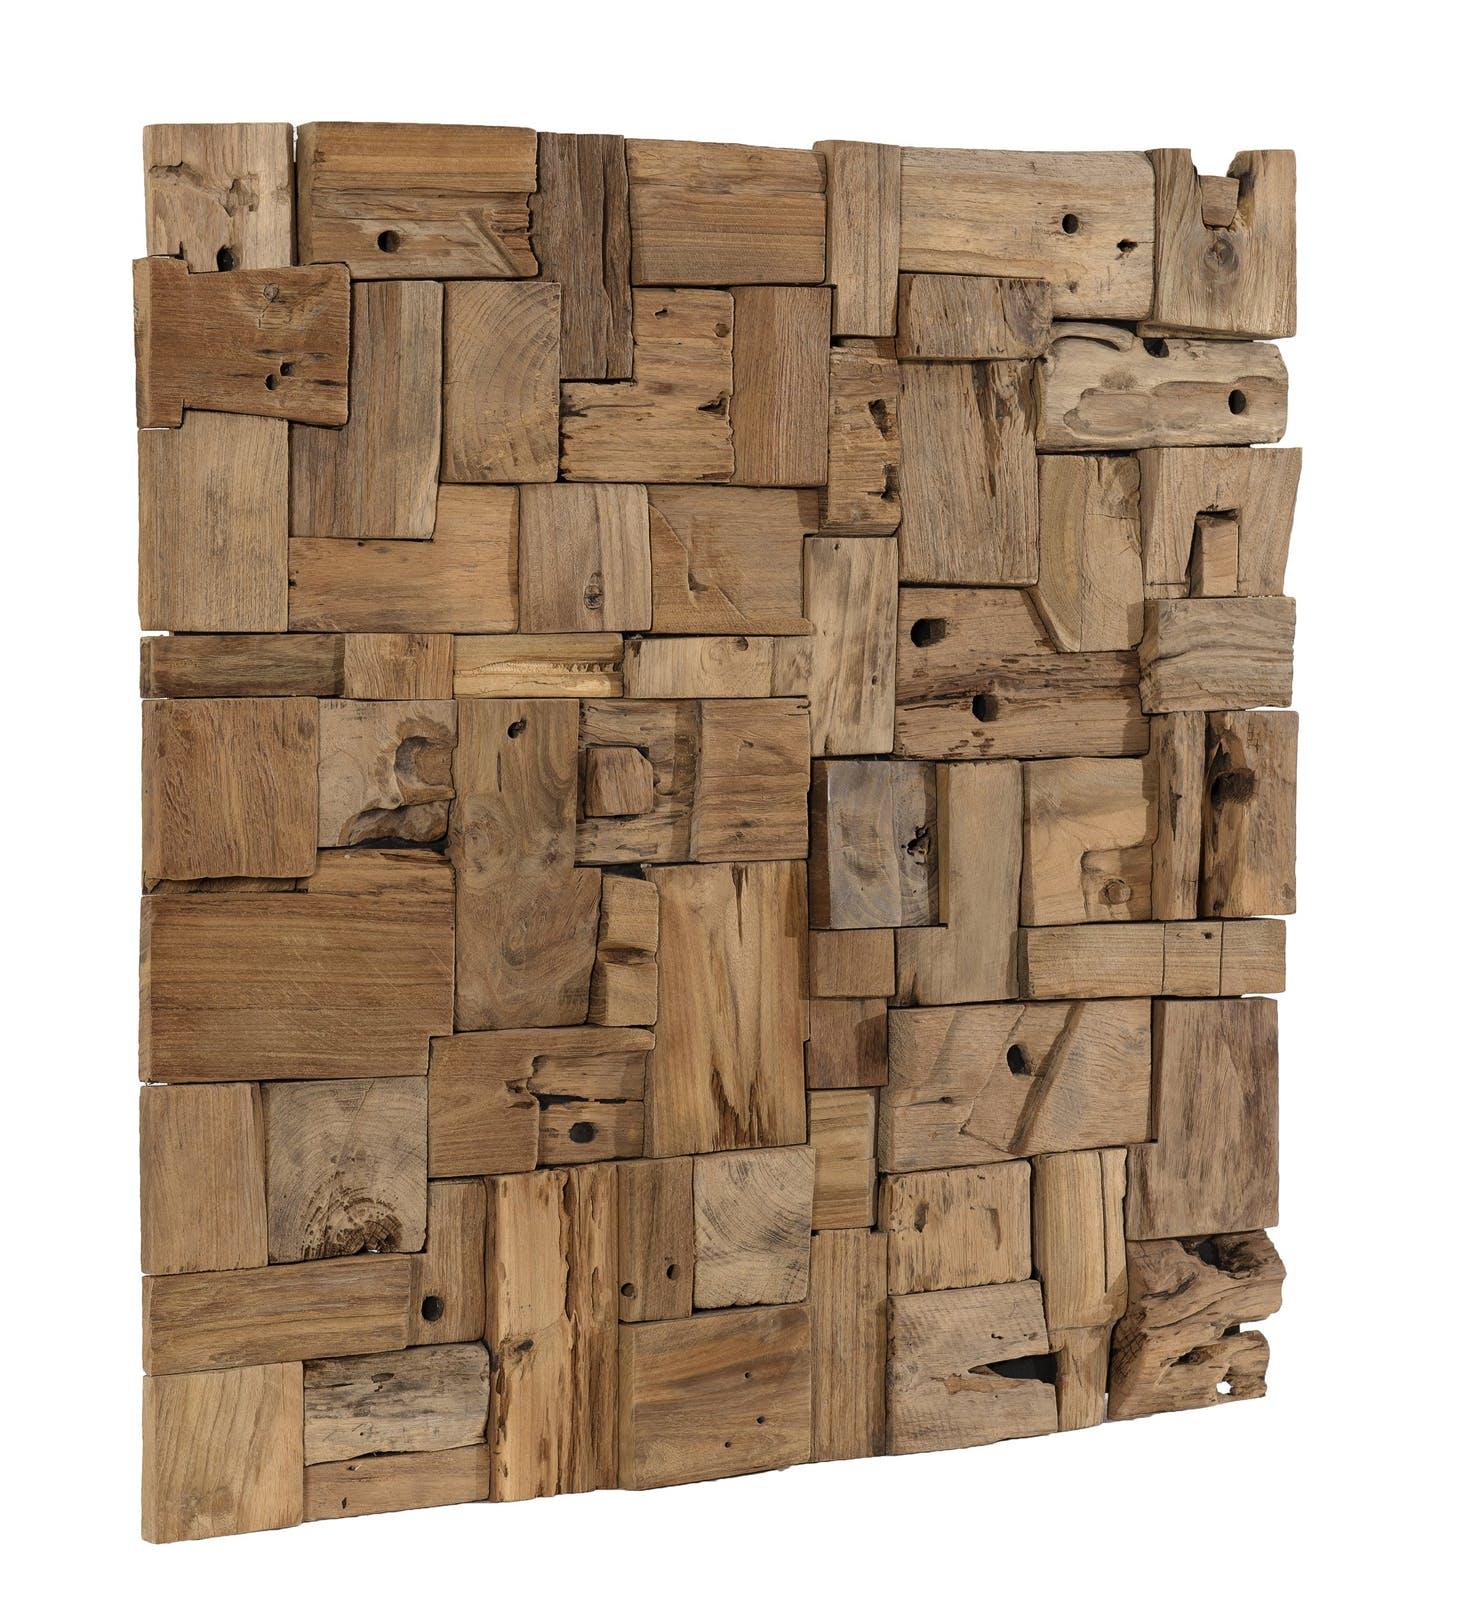 d coration murale en teck bois flott mod le n 8. Black Bedroom Furniture Sets. Home Design Ideas